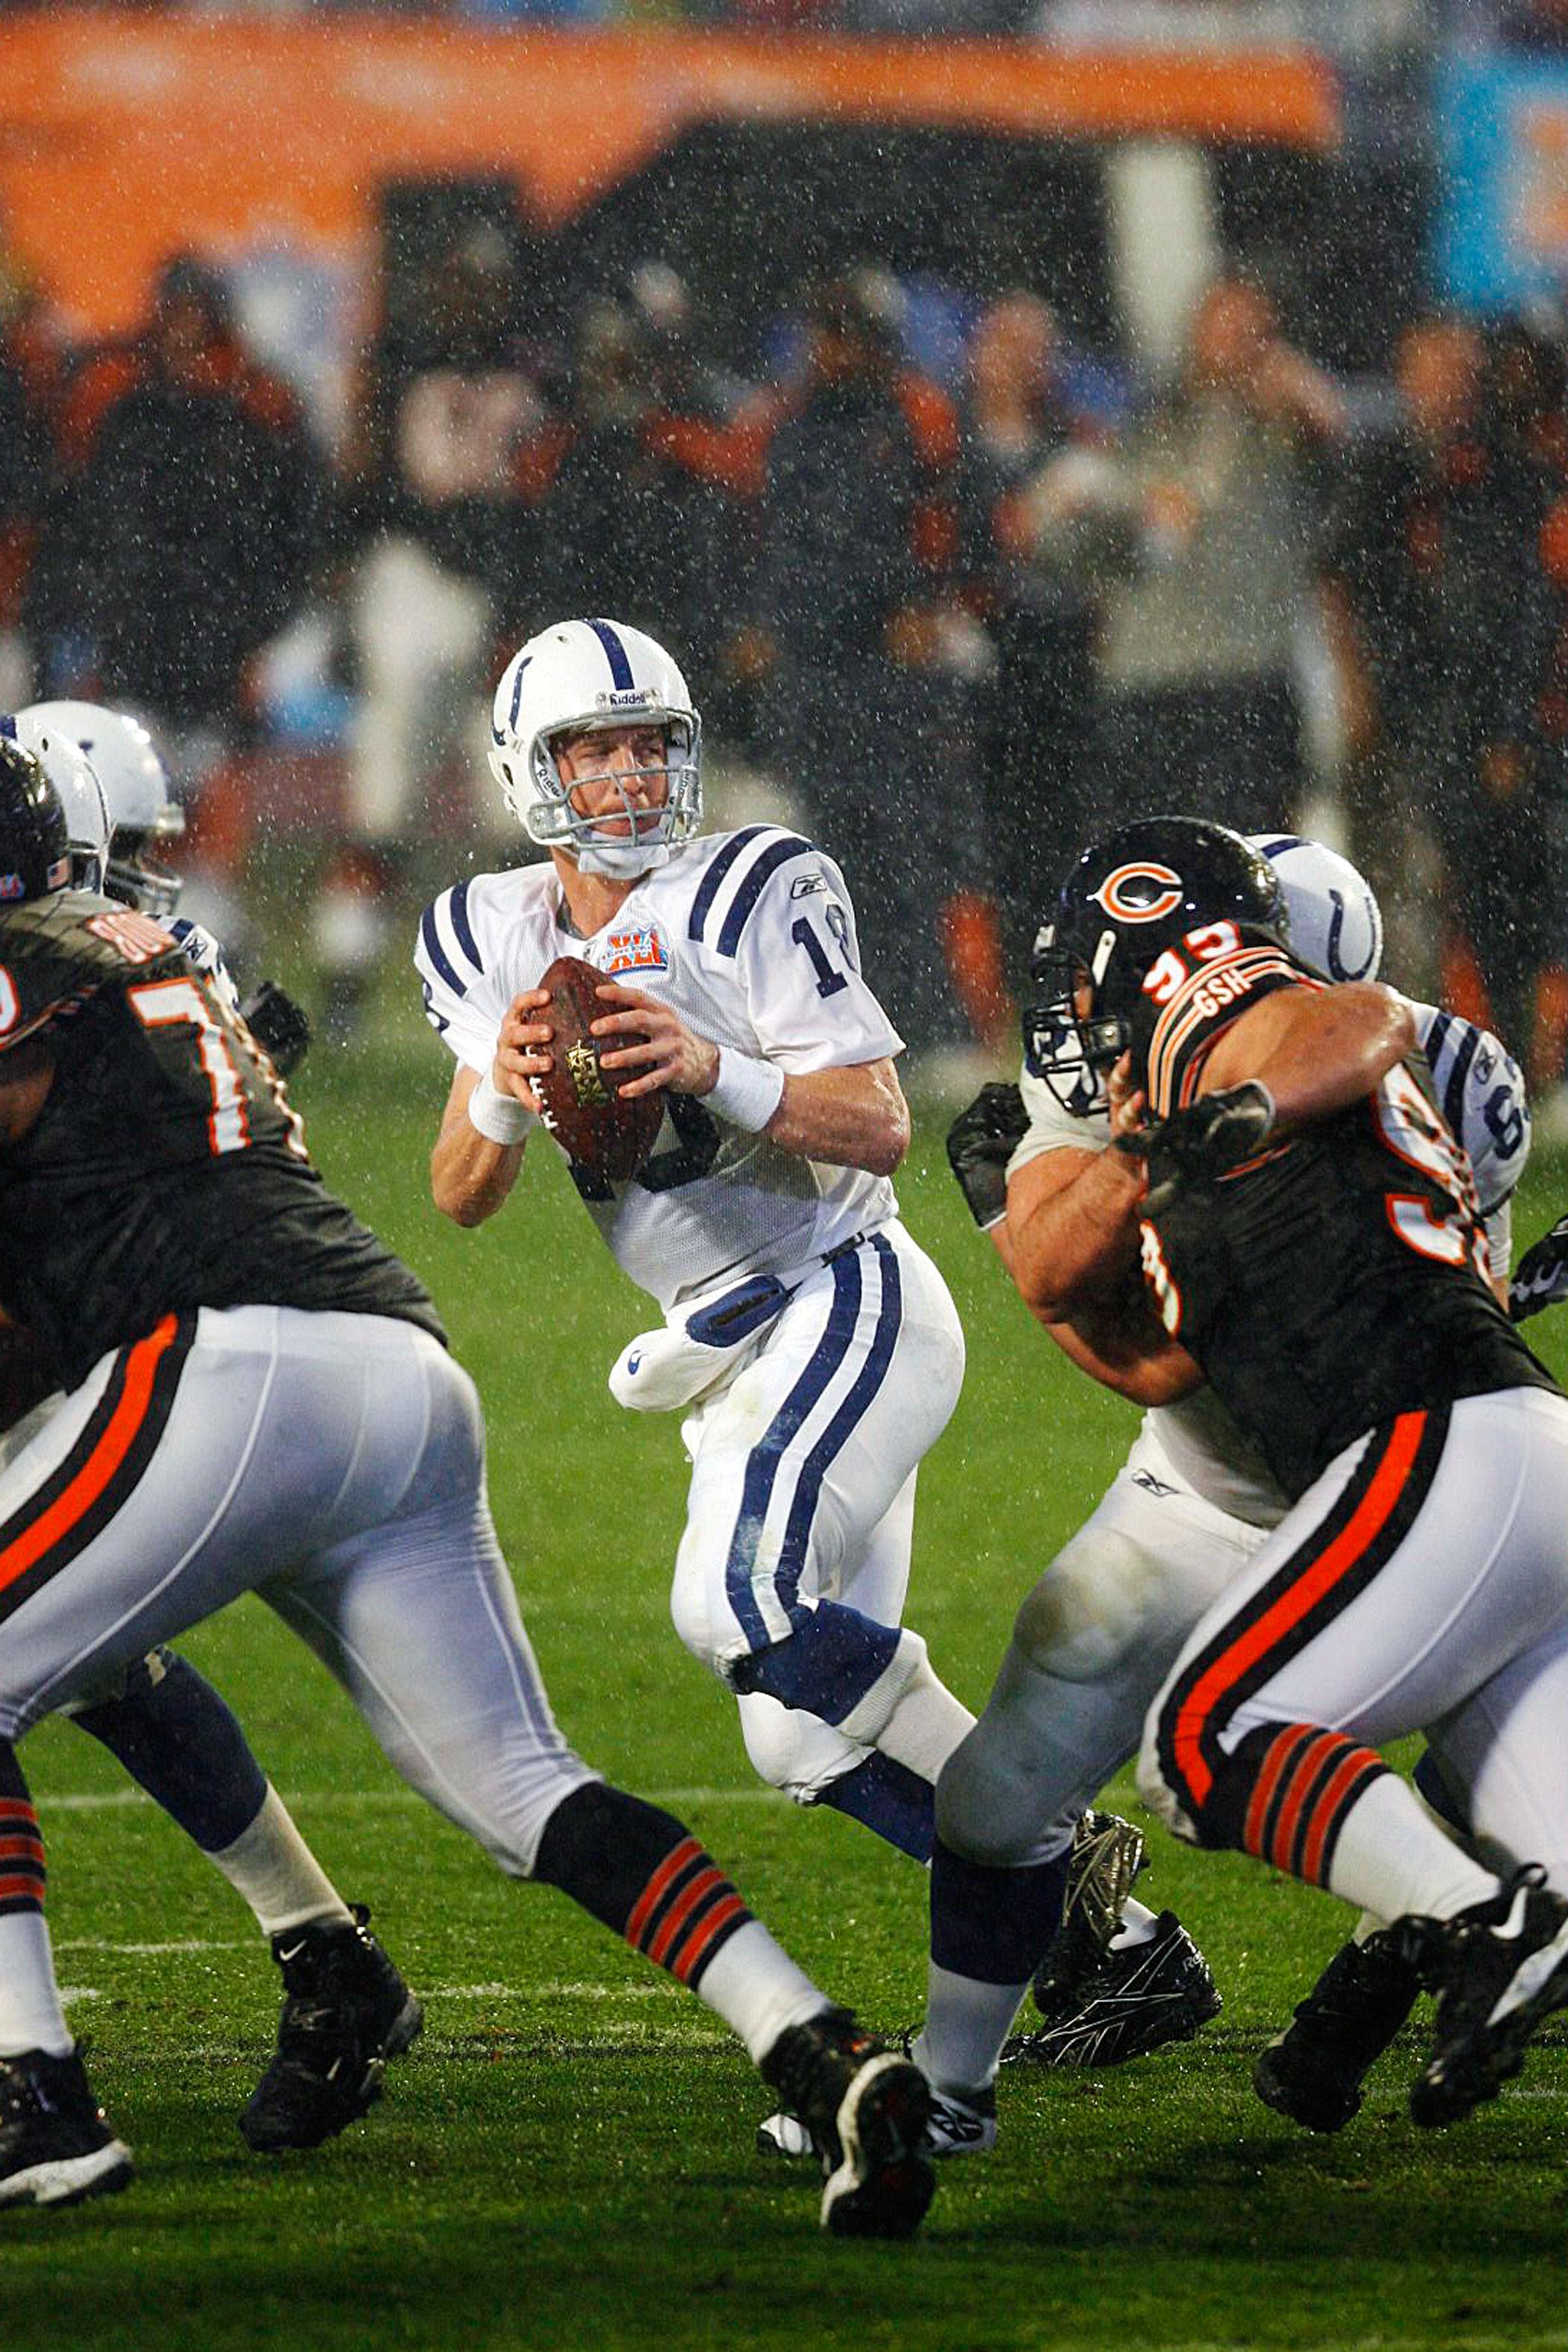 Super Bowl XLI, Feb. 4, 2007                               Chicago Bears vs. Indianapolis Colts in Miami